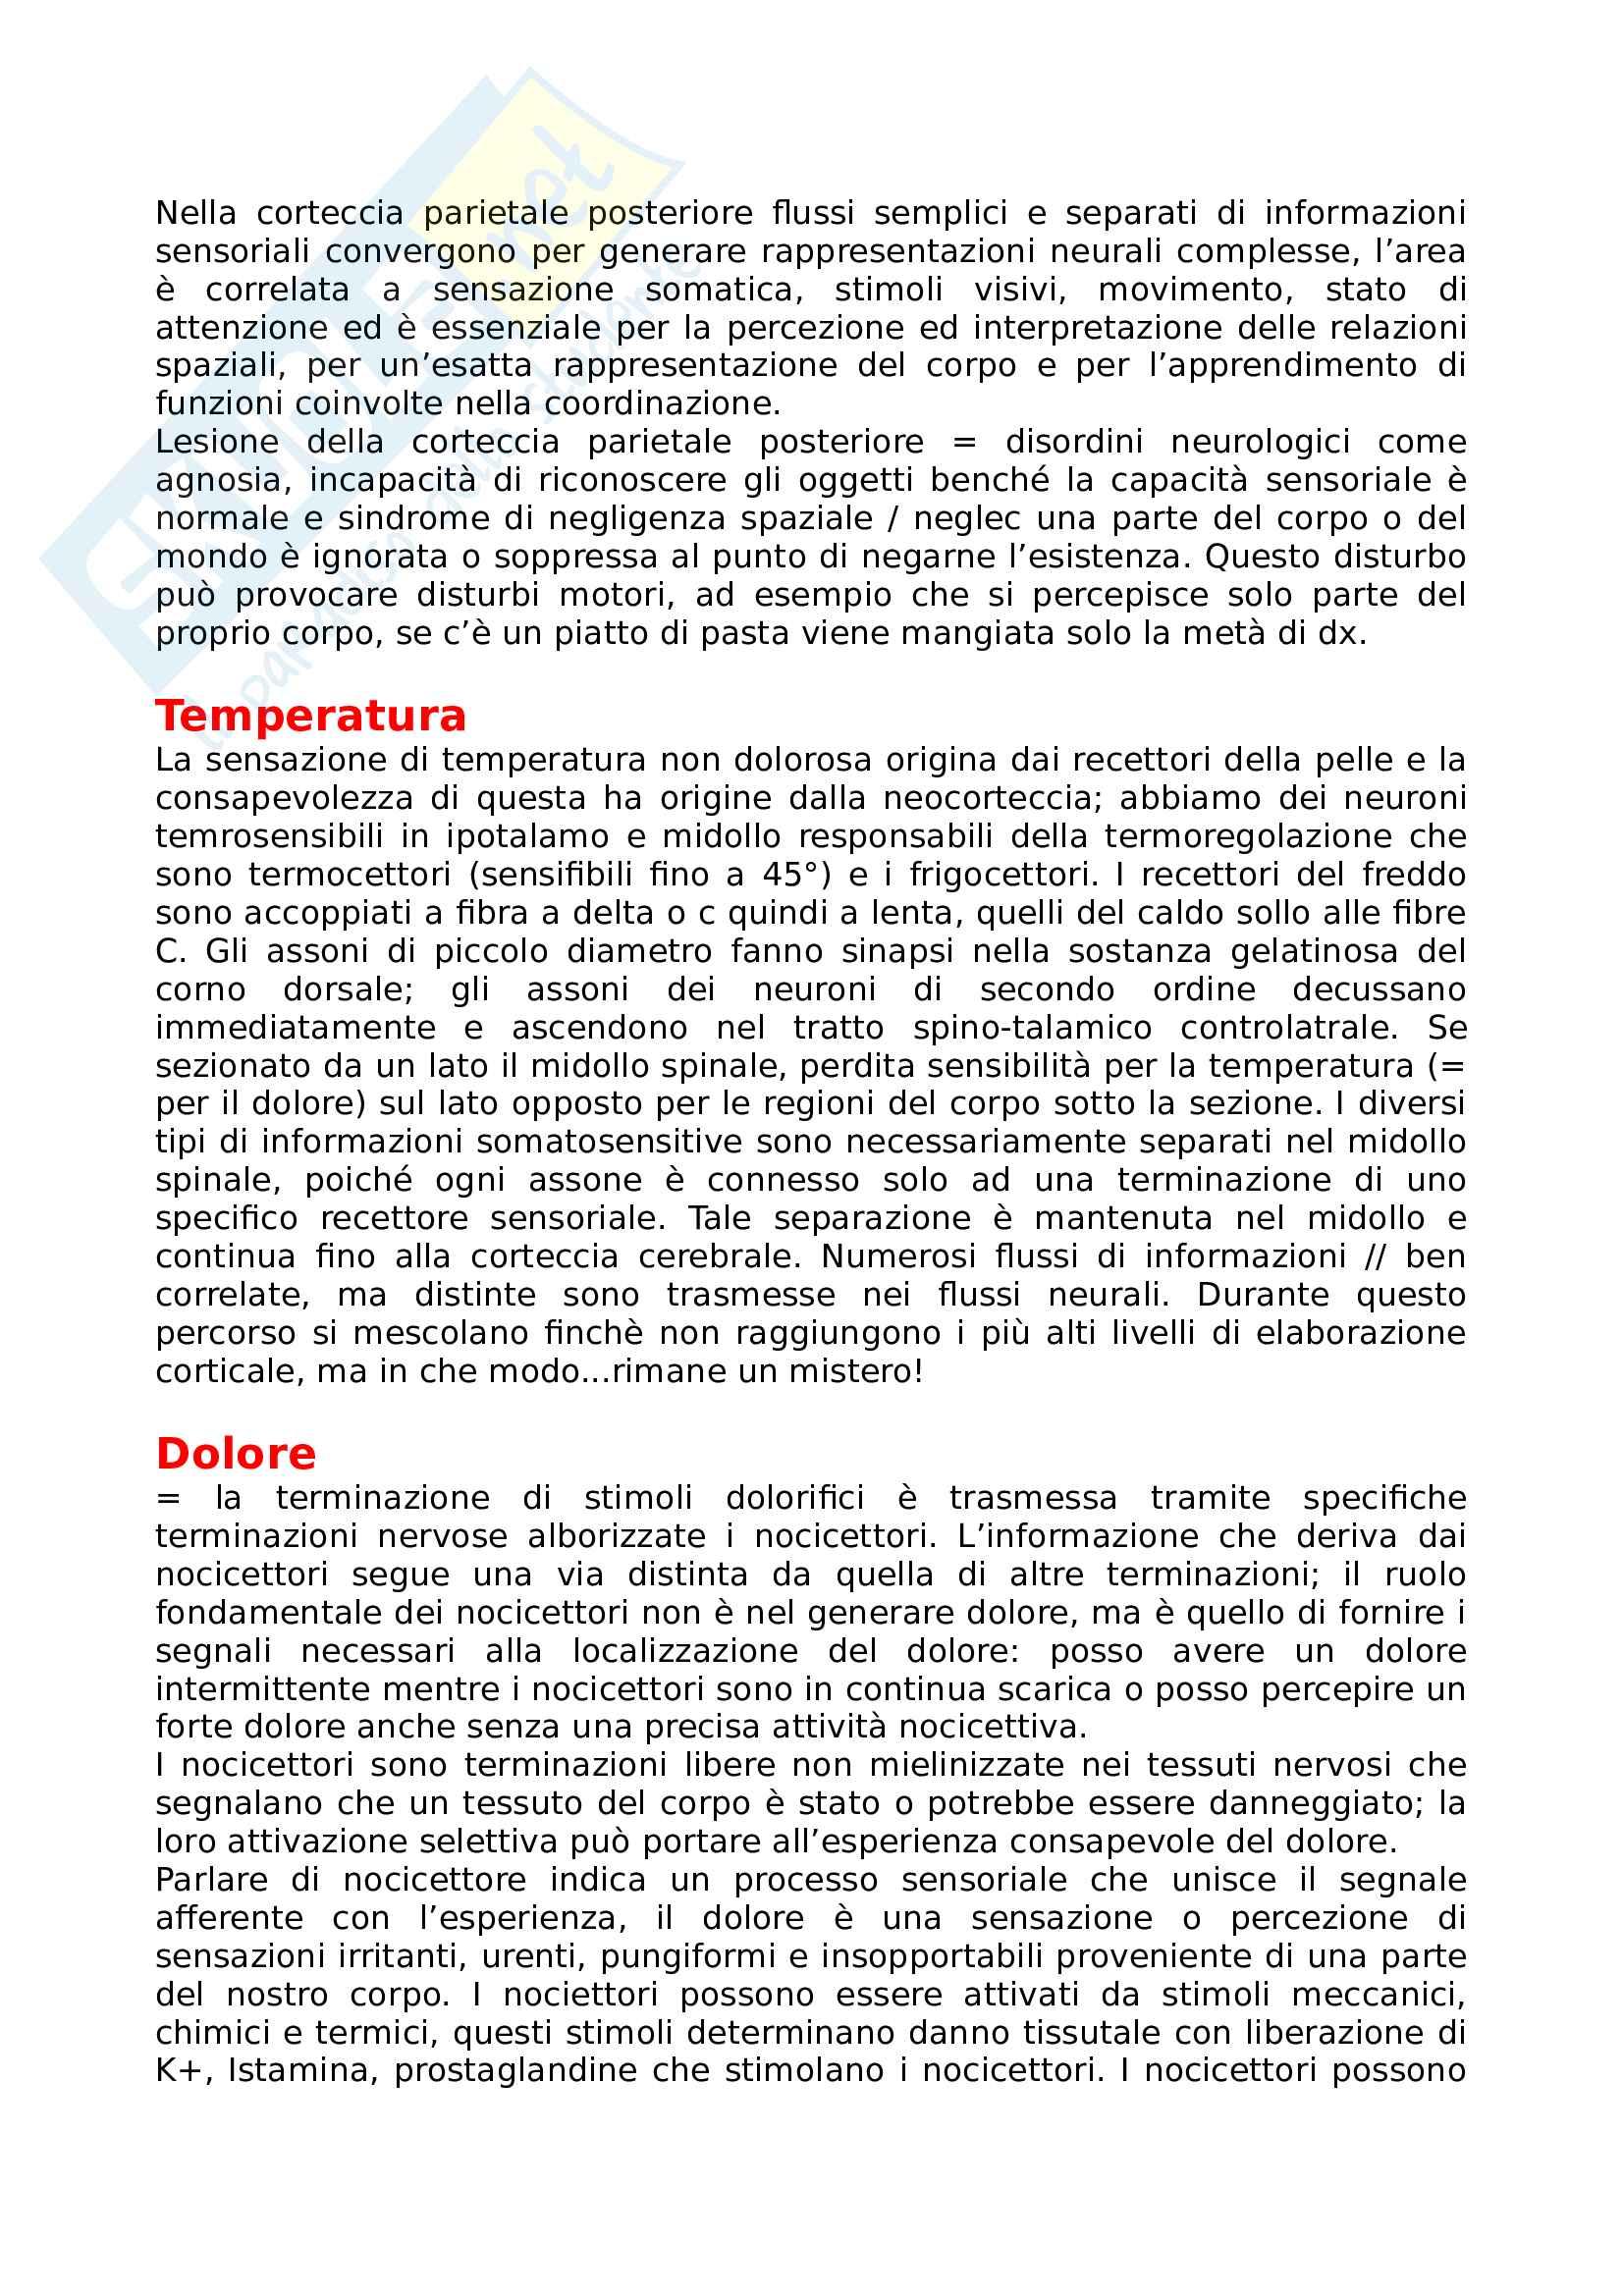 Sistema somatosensoriale Pag. 6